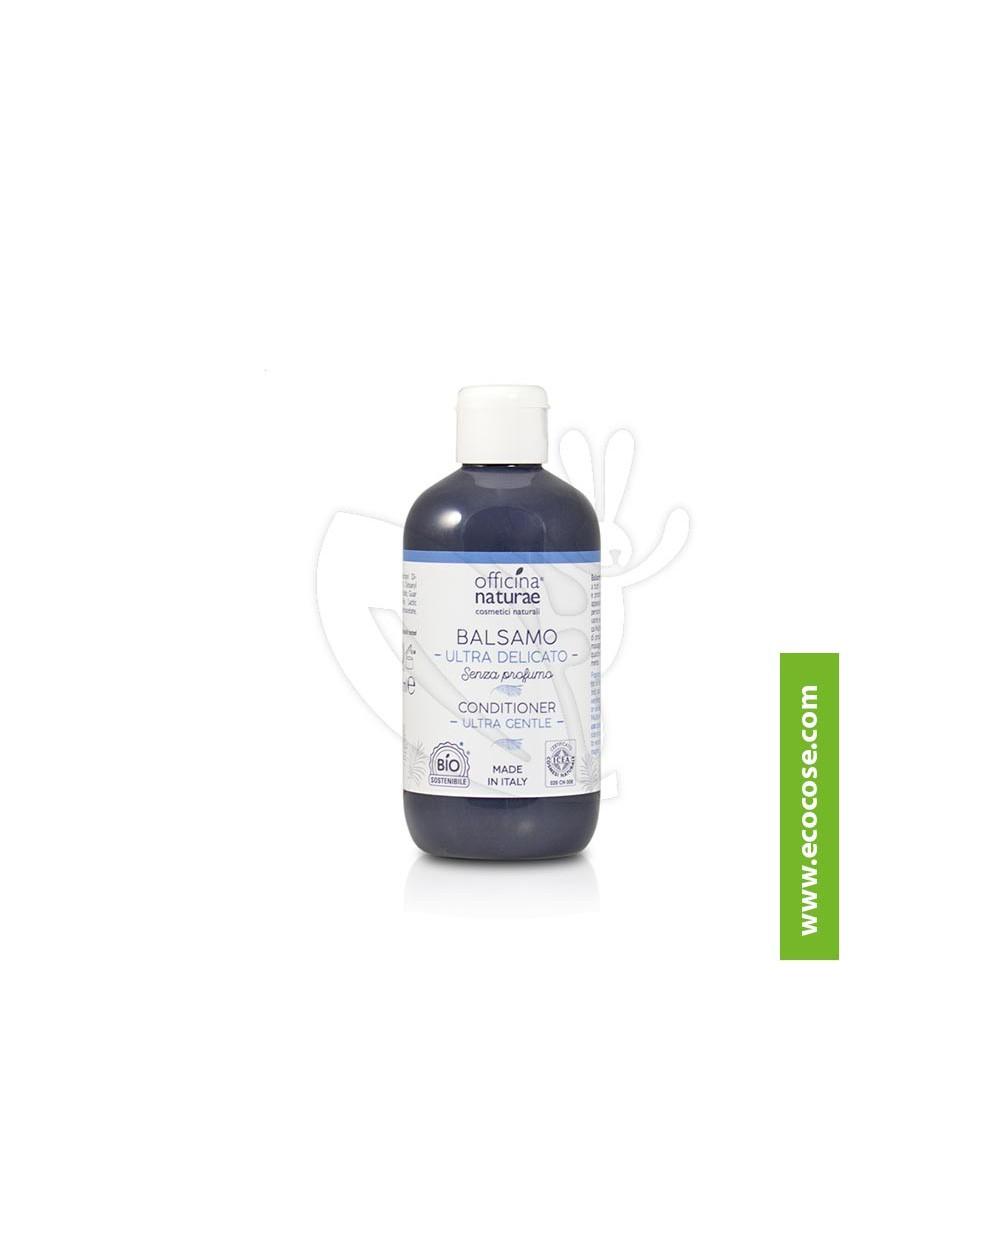 Officina Naturae - Gli ULTRADELICATI - Shampoo senza profumo